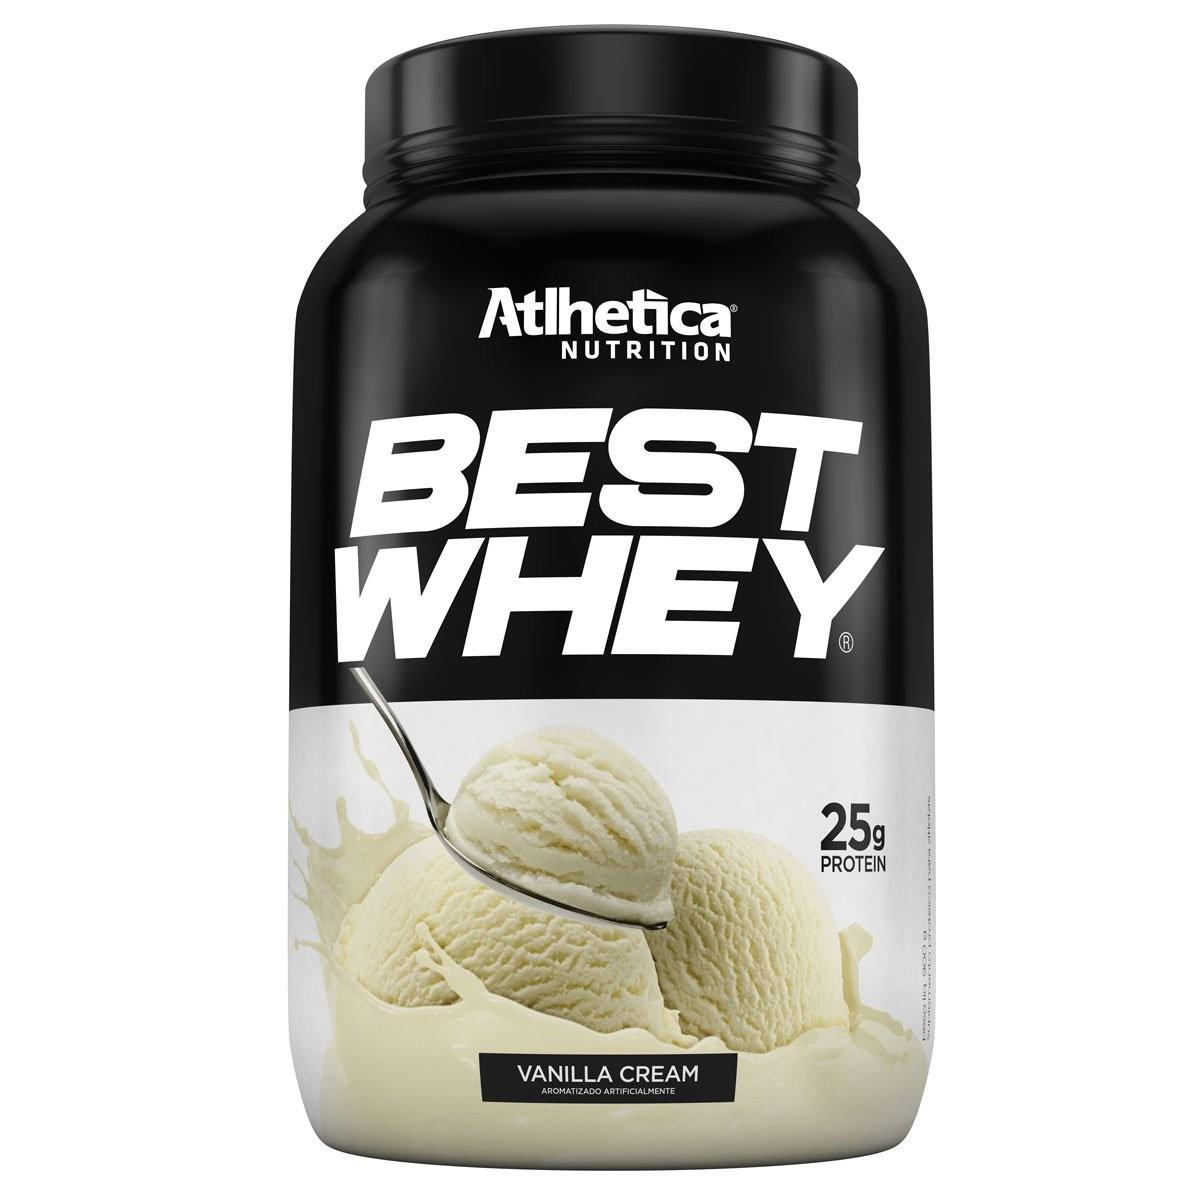 BEST WHEY Sabor Baunilha Cream (900g) - Atlhetica Nutrition